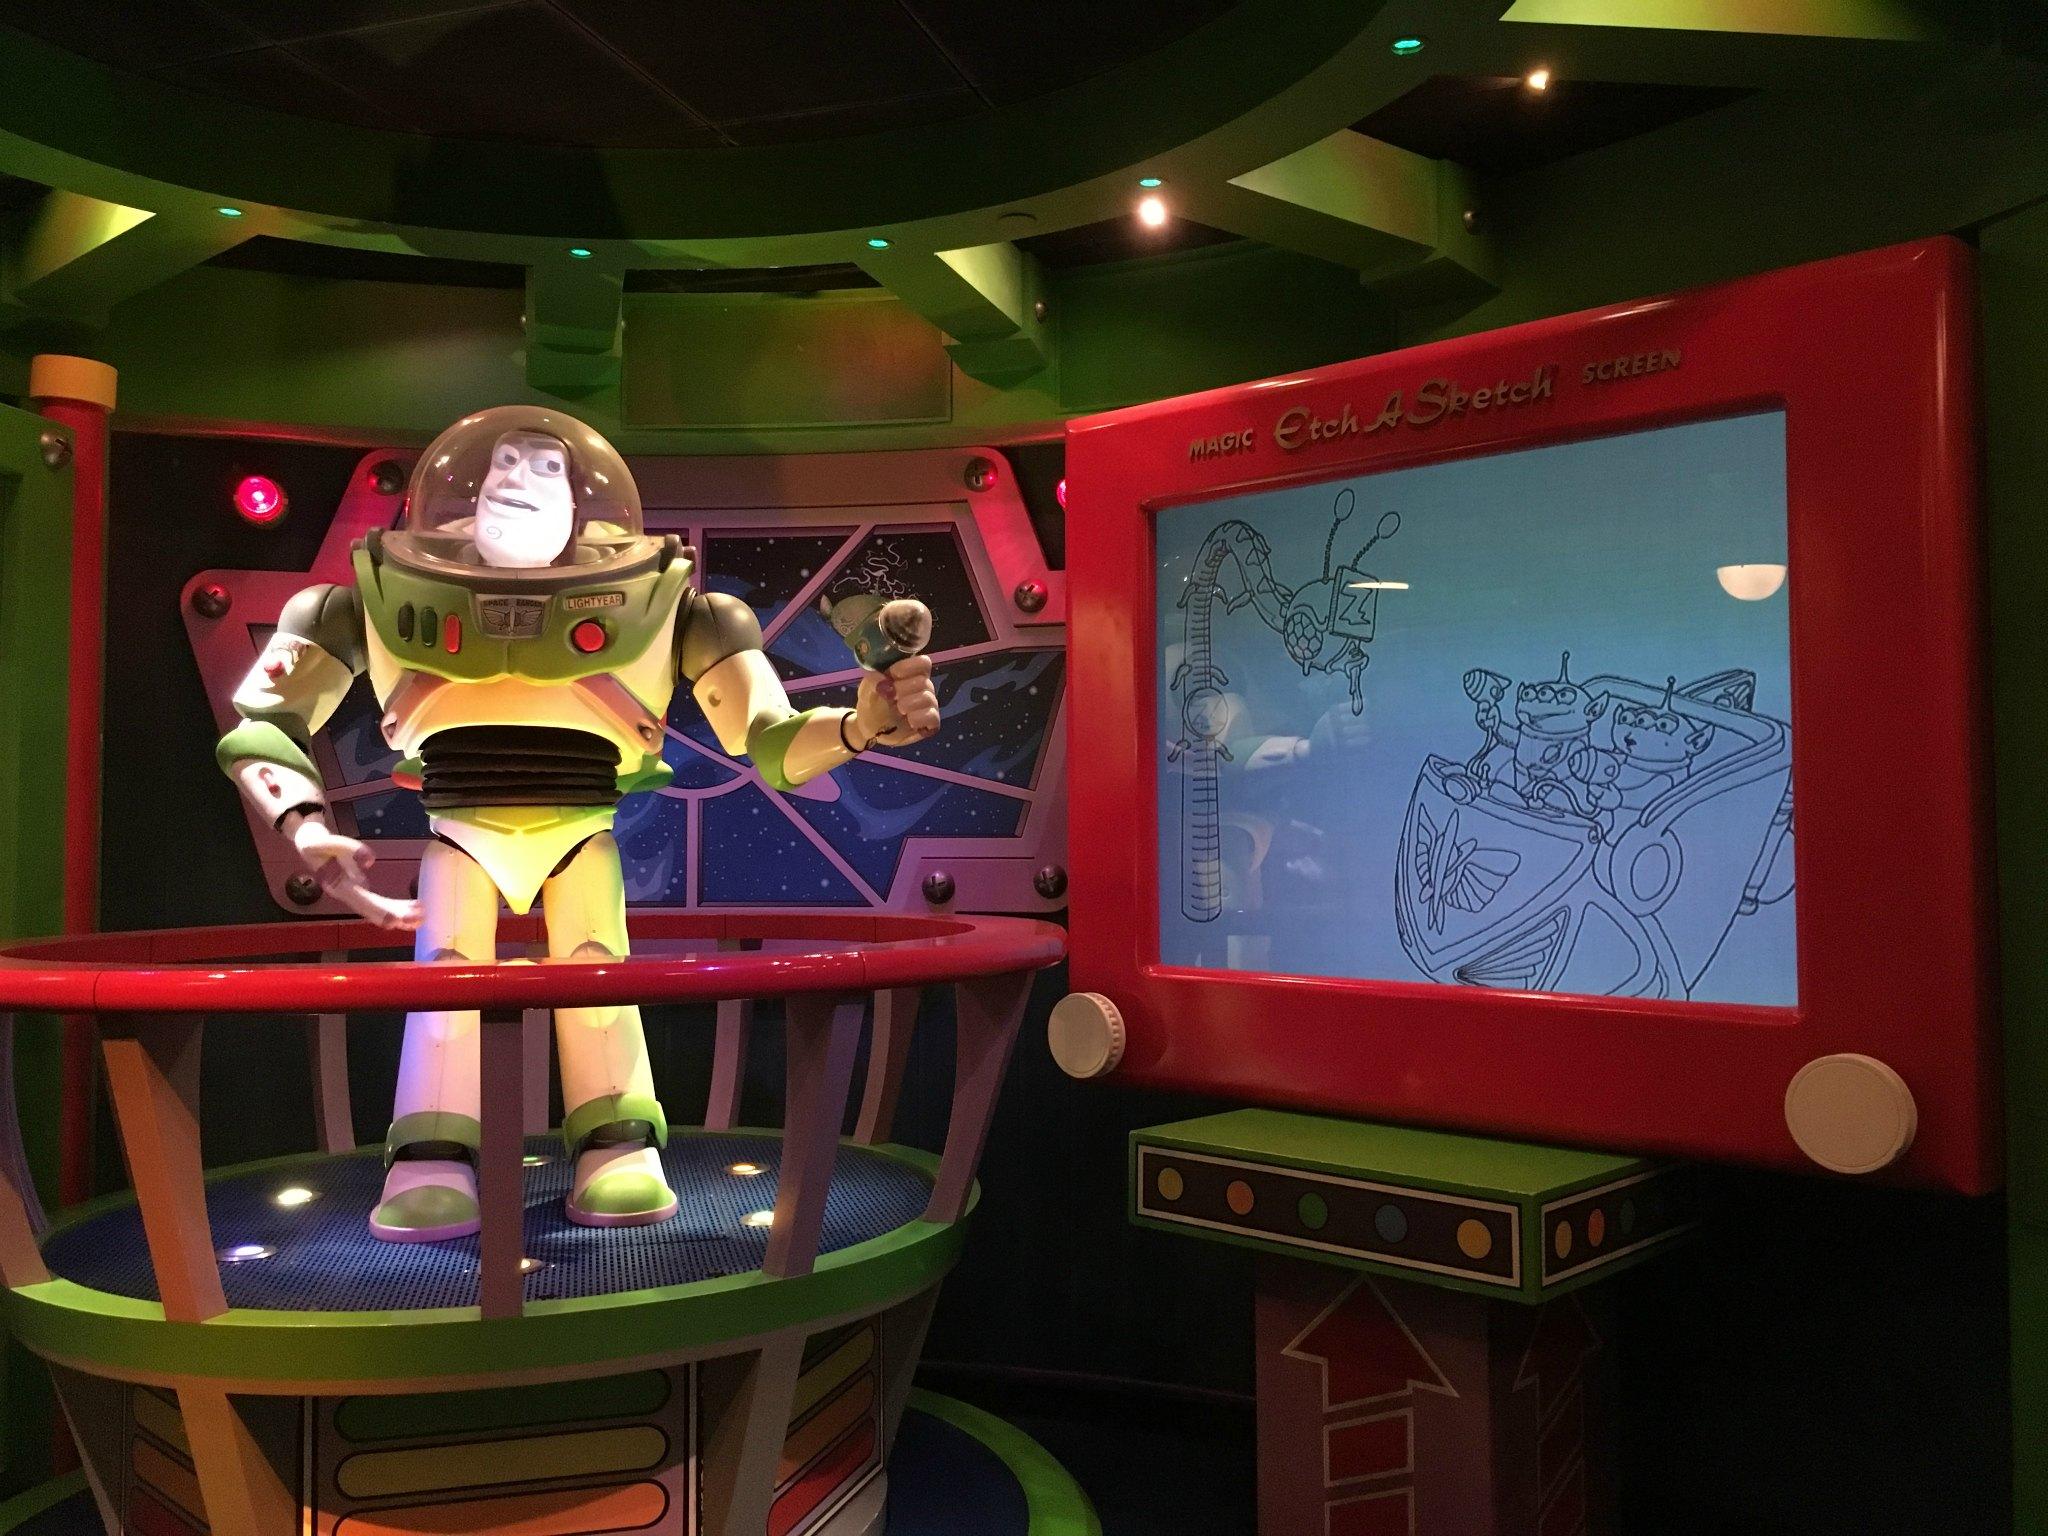 Buzz lightyear laser blast ride